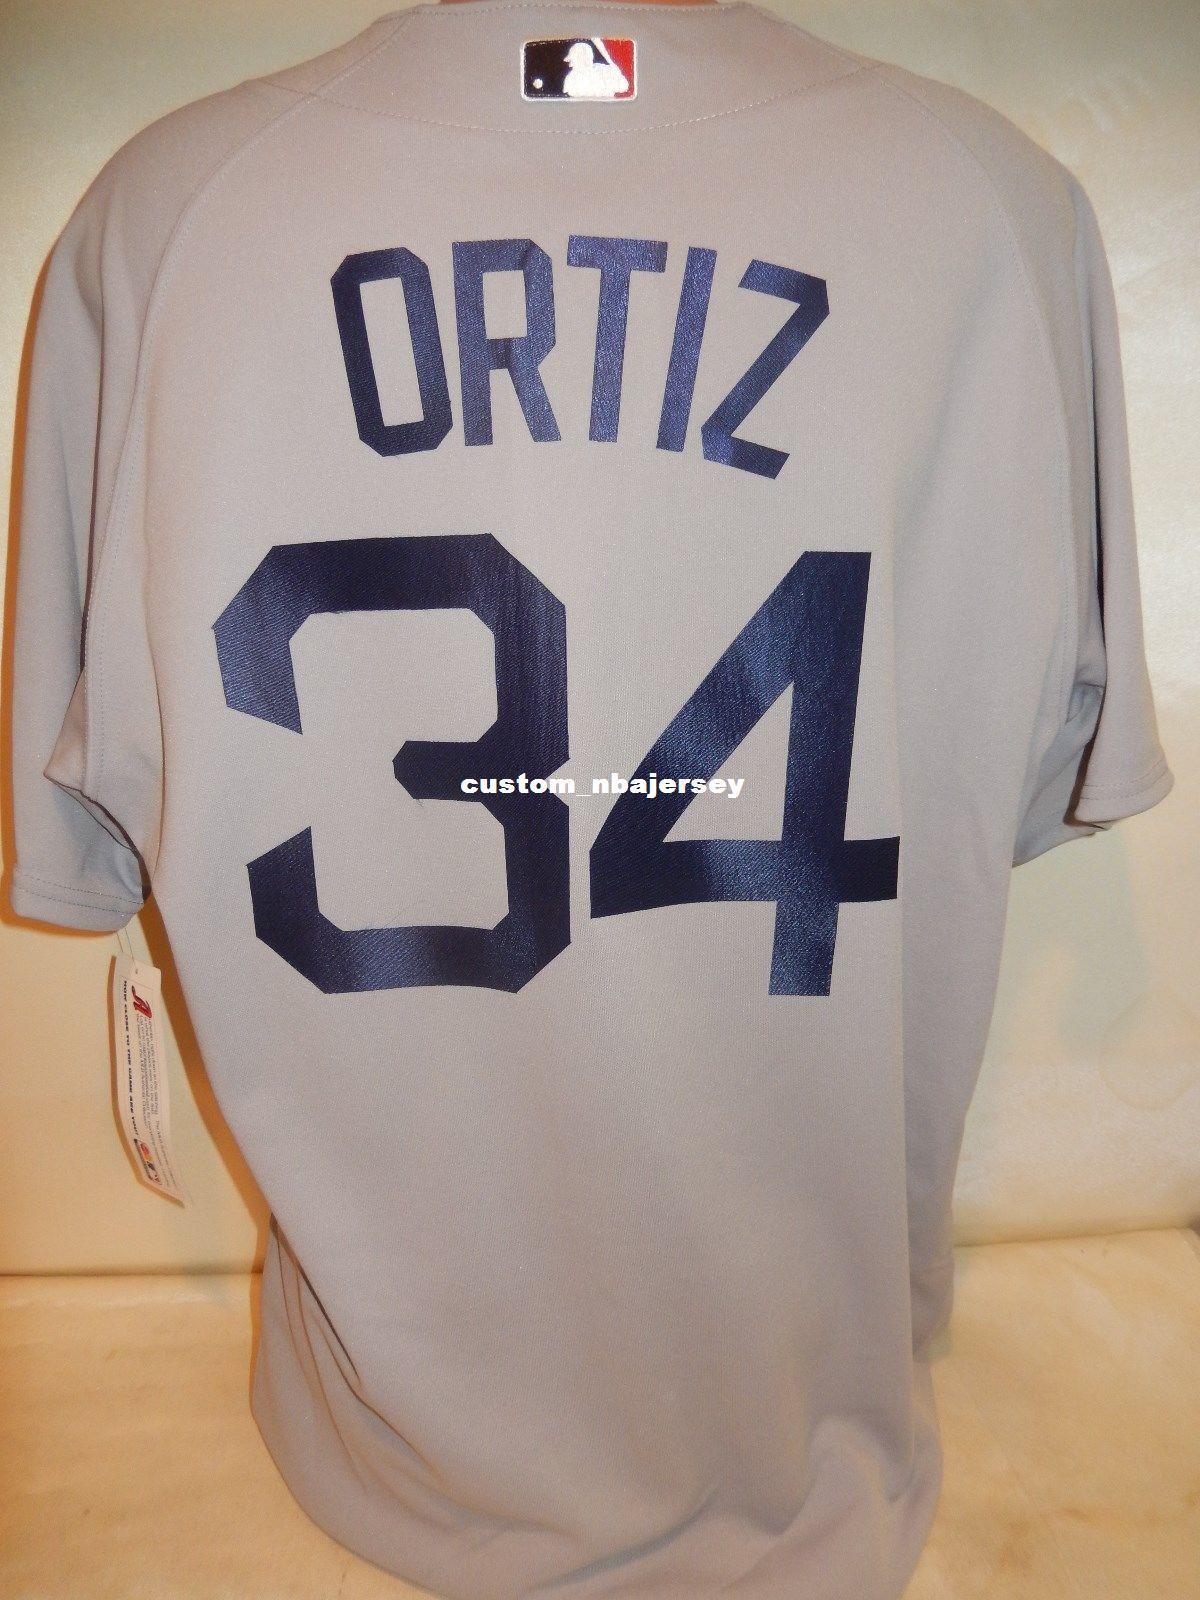 2019 Cheap Custom DAVID ORTIZ Baseball Jersey Gray NEW Stitched Customize  Any Name Number MEN WOMEN BASEBALL JERSEY XS 5XL From Custom nbajersey 02331f86e5c